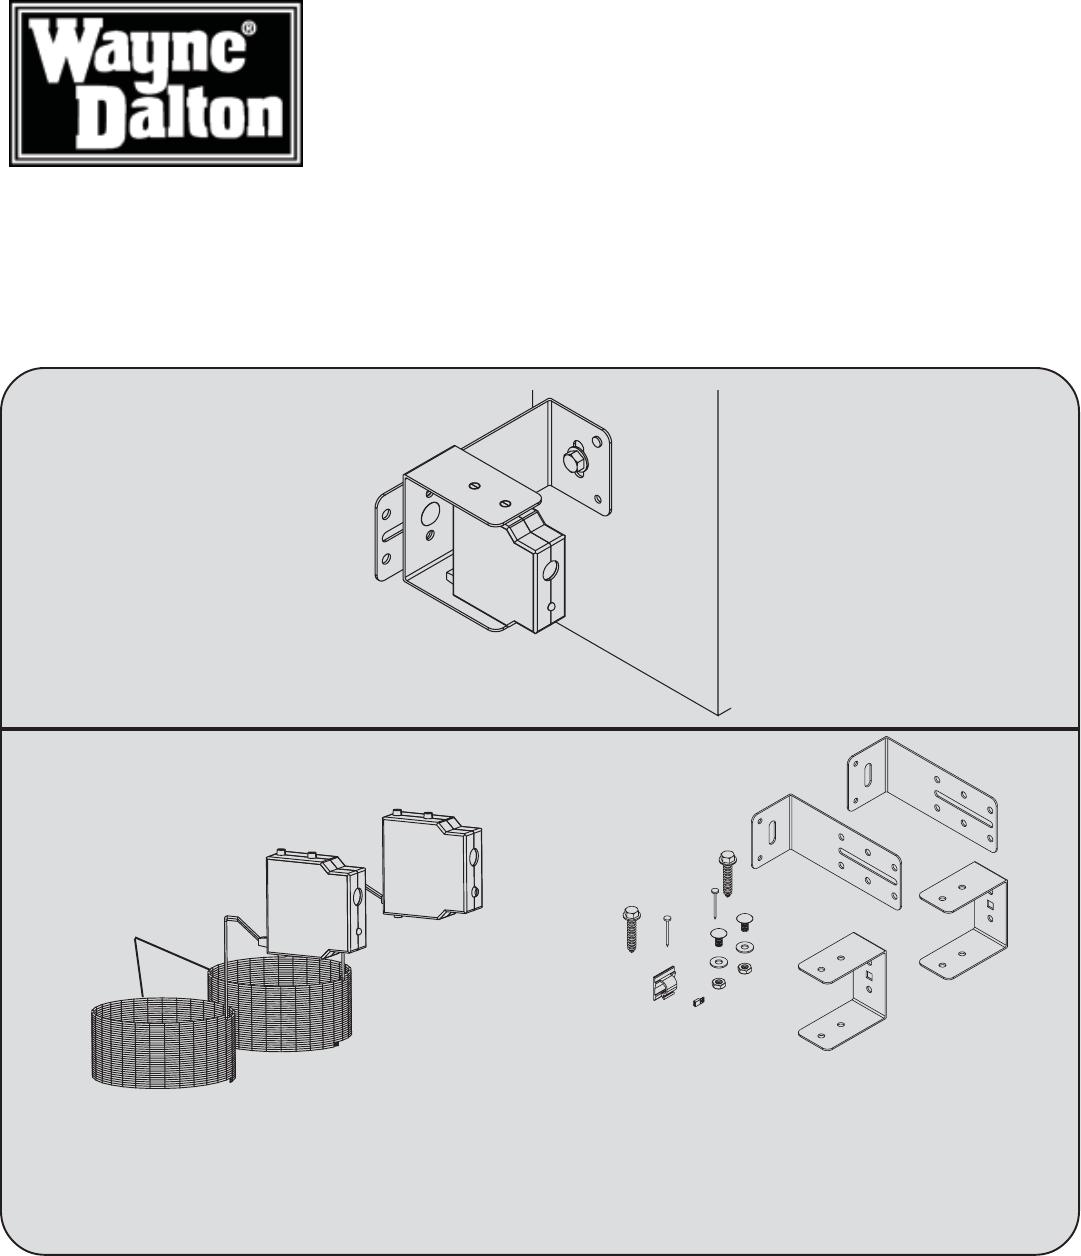 Wayne Dalton 3012 3014 3651 372 3750 372 Installation Instructions